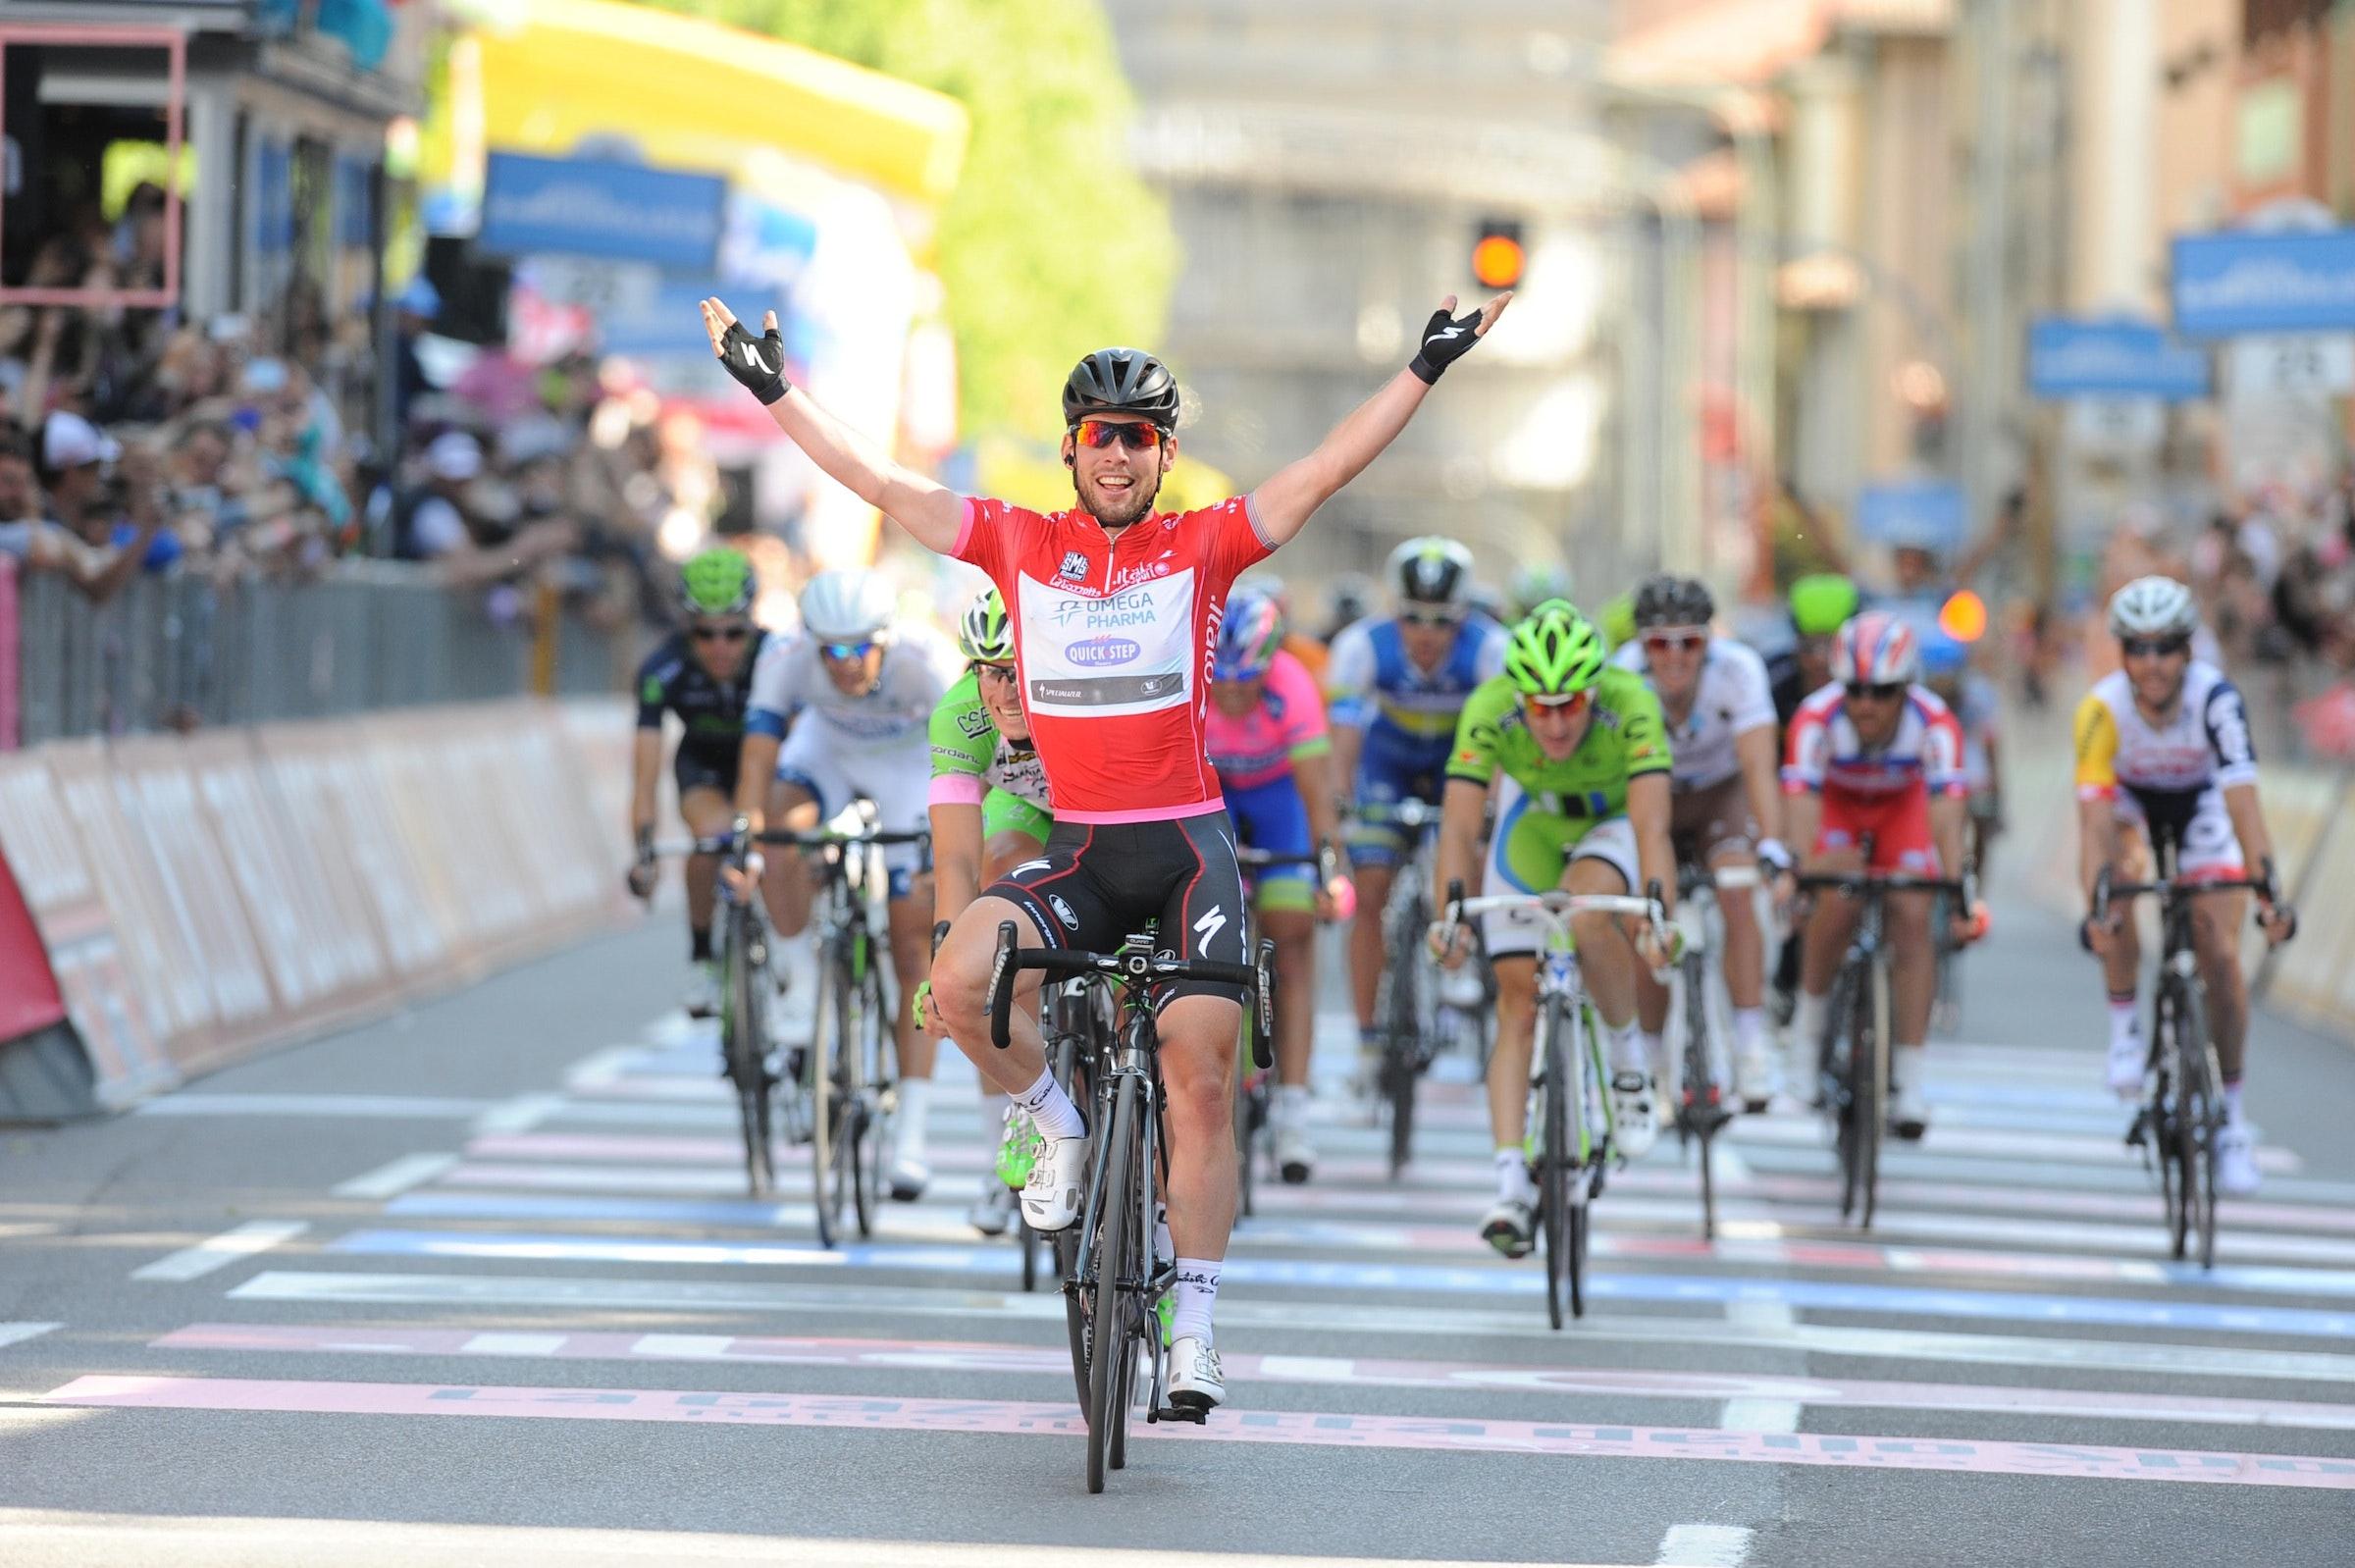 Mark Cavendish, Giro d'Italia, stage 21, salute, pic: Stefano Sirotti